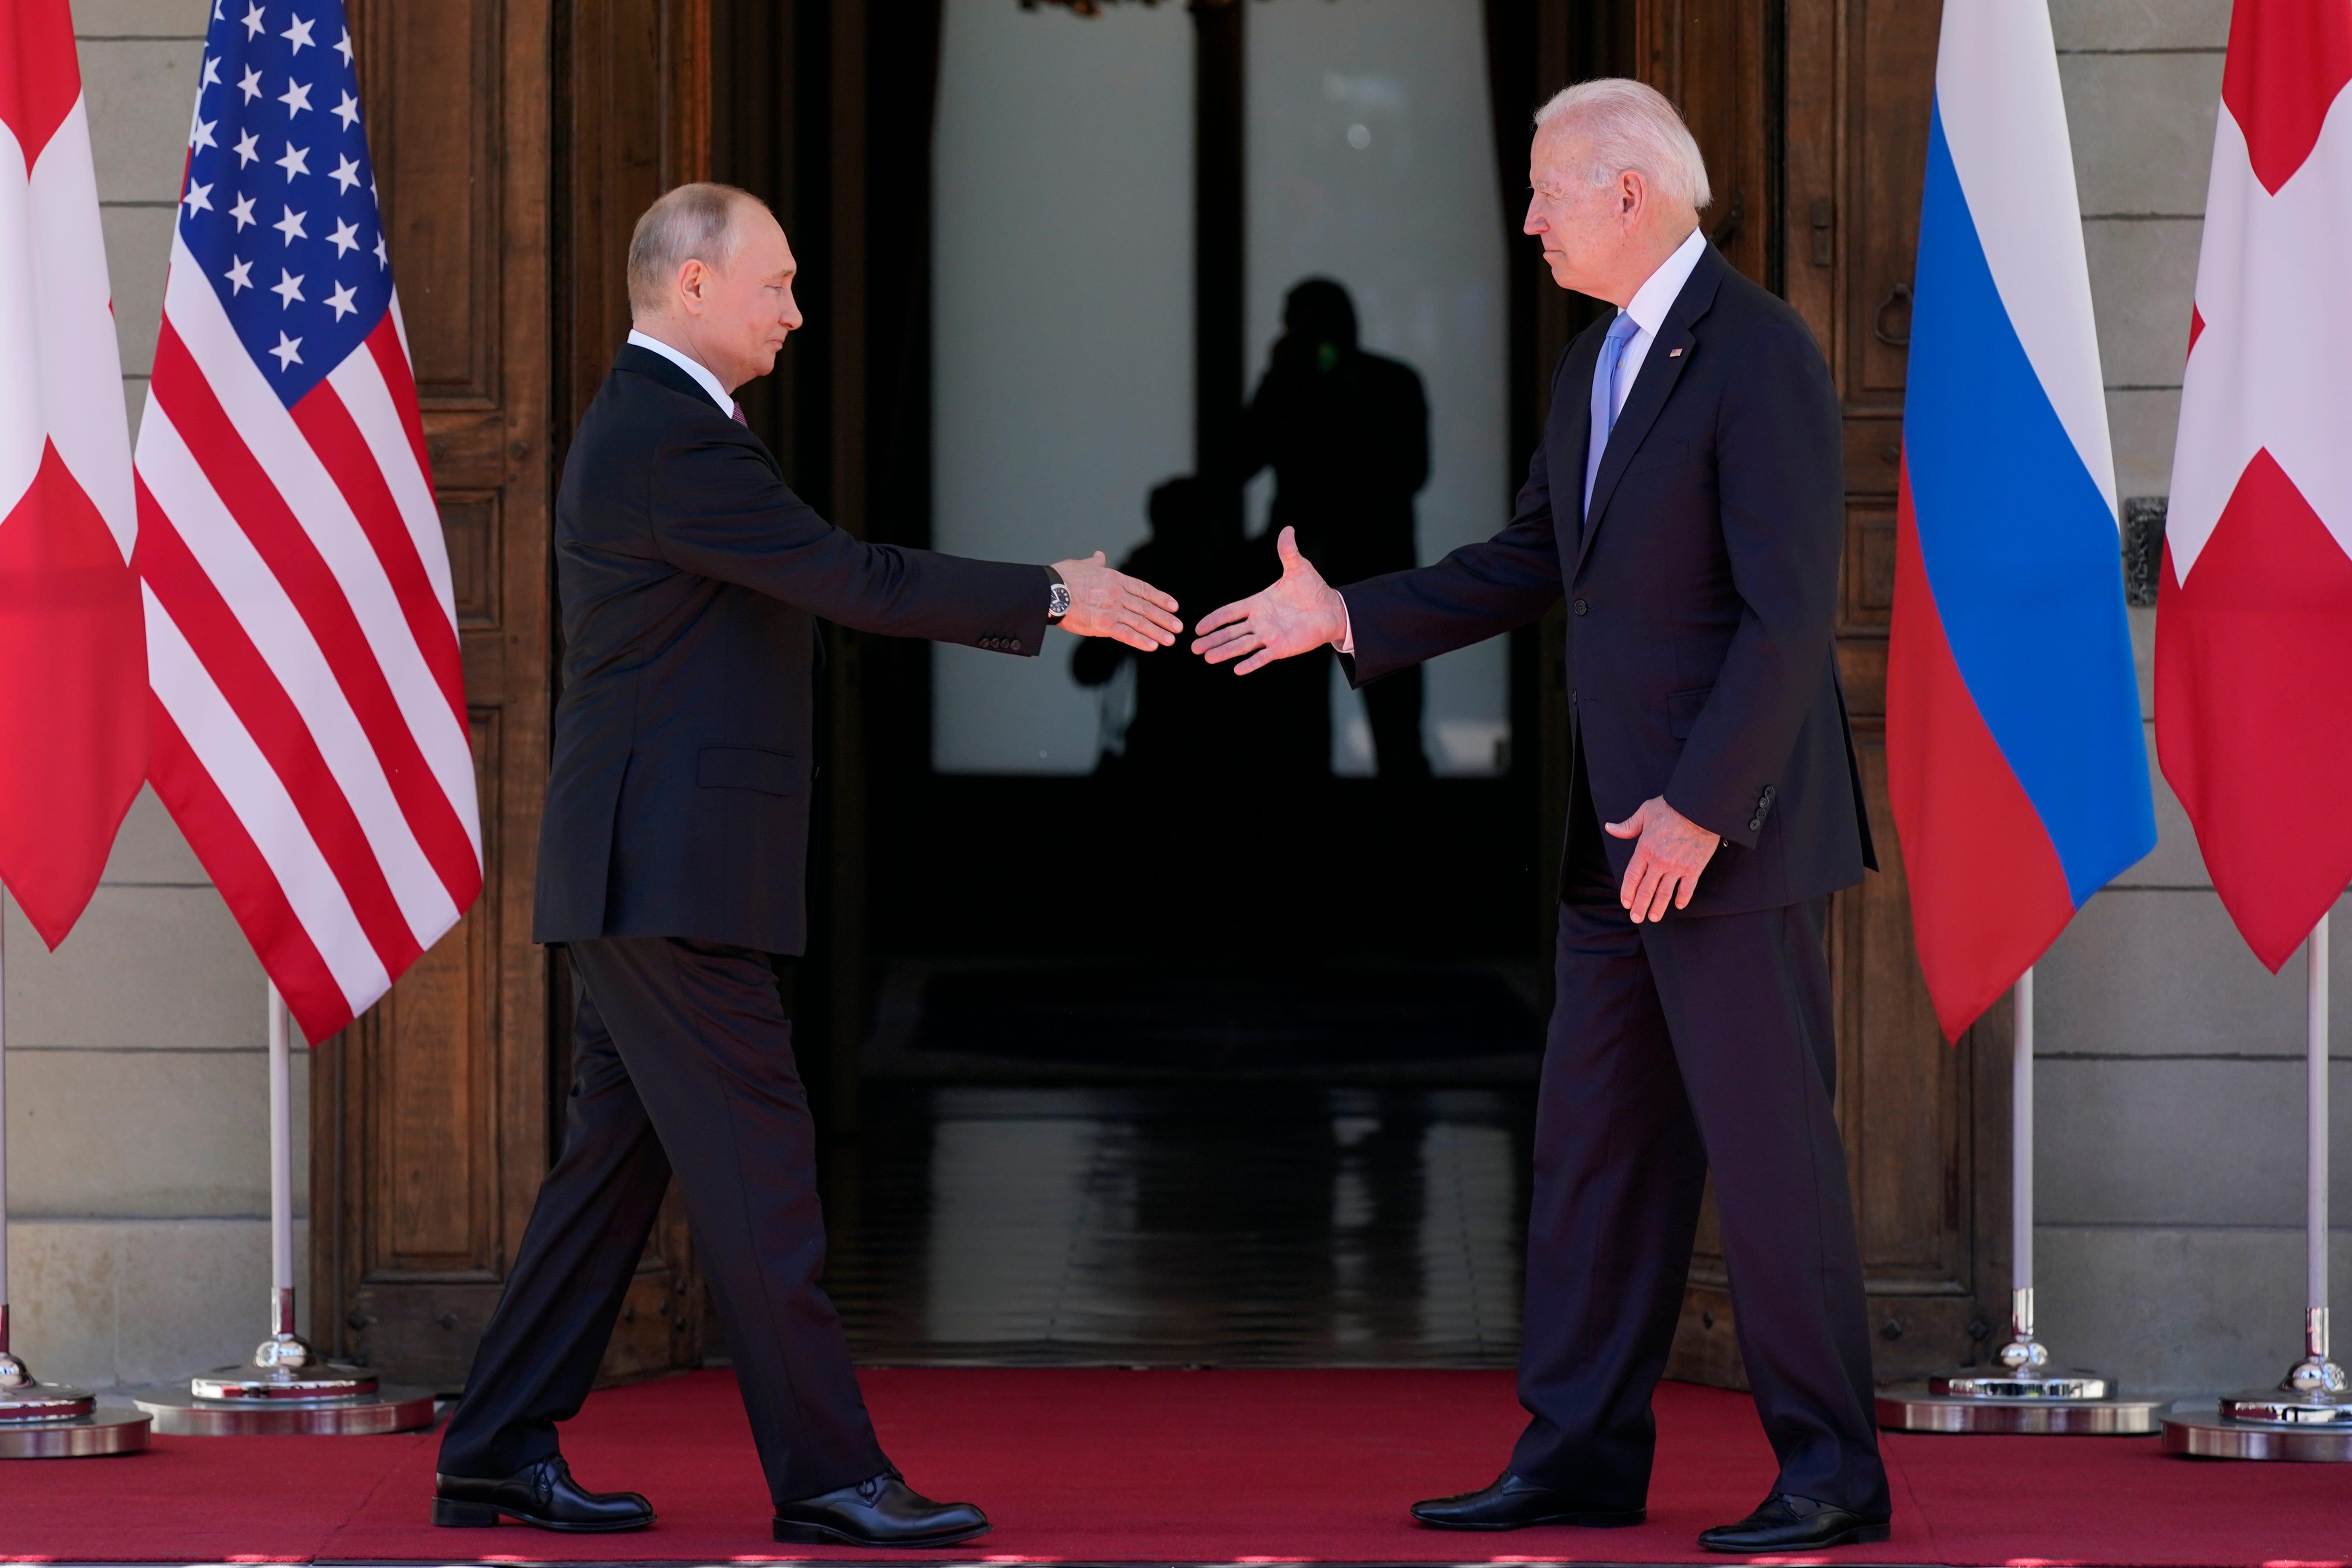 Geneva Summit 5 Takeaways From Biden Putin S In Person Meeting